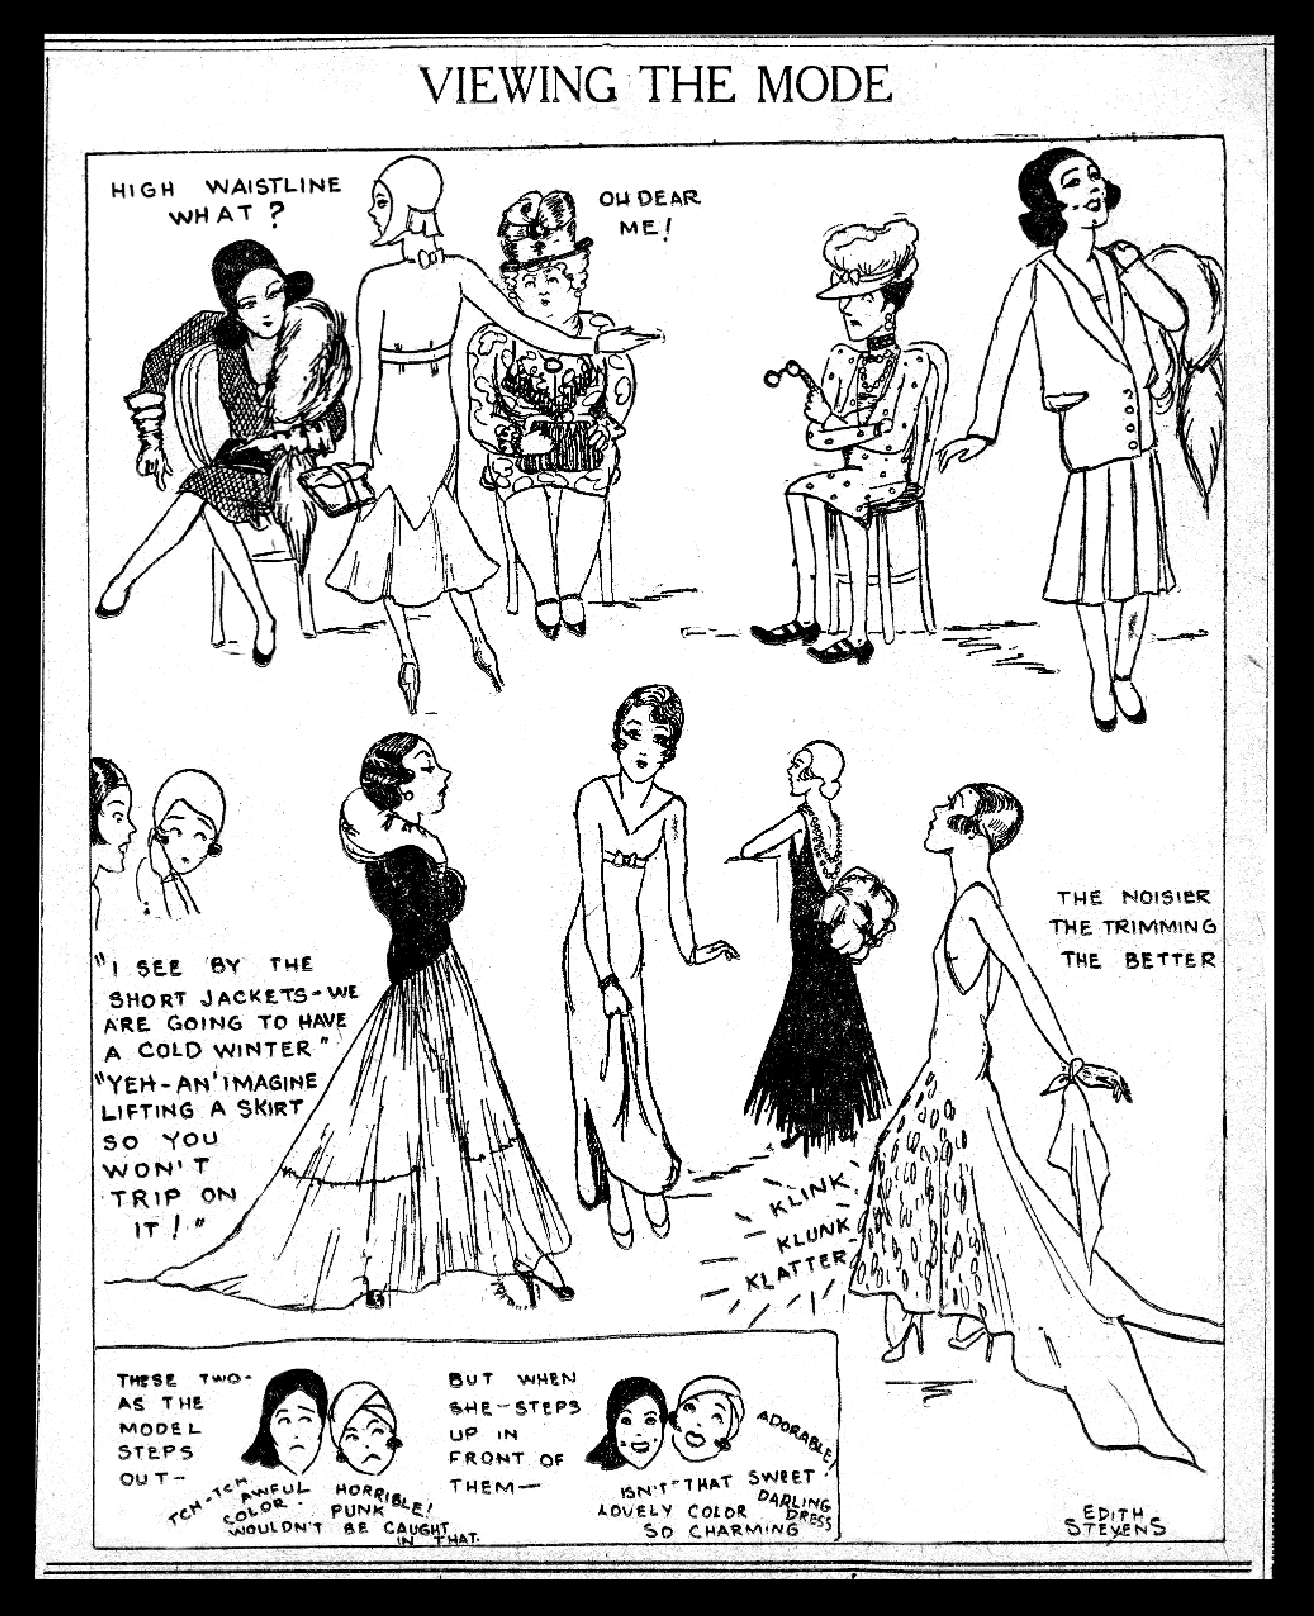 Us Girls by Edith Stevens. October 23, 1929